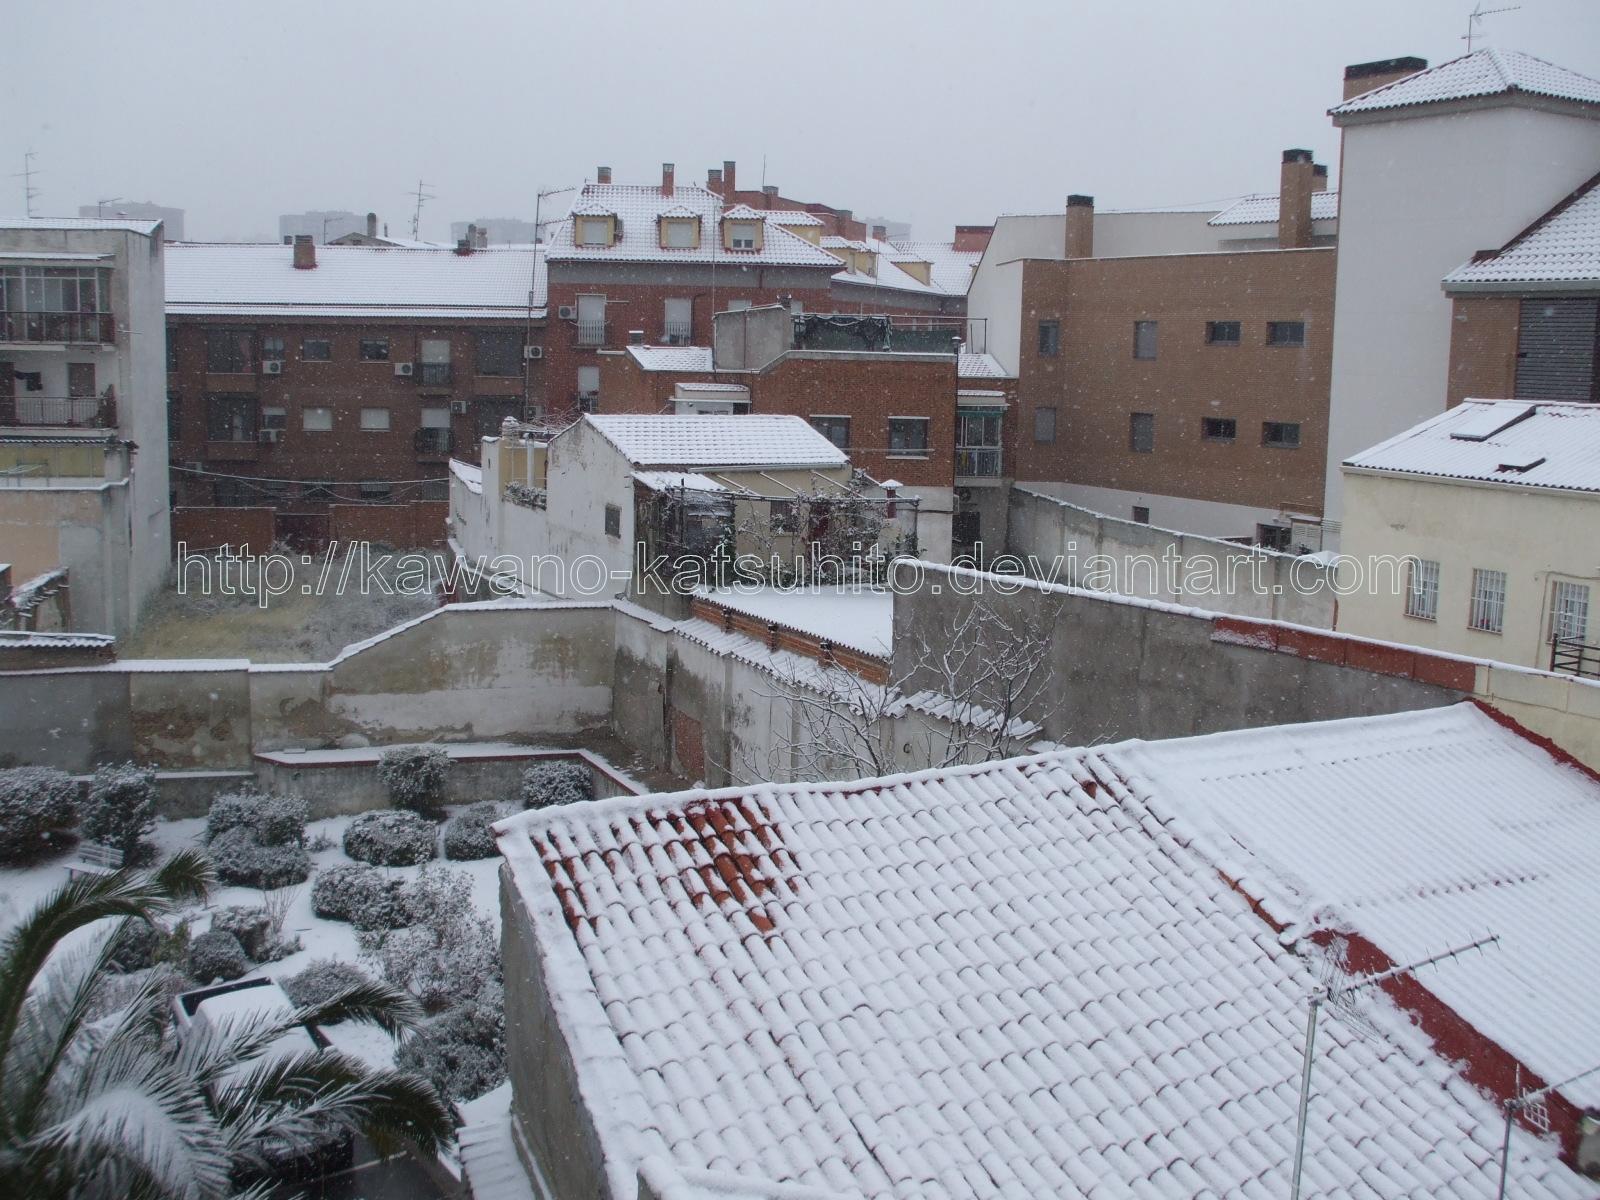 Snow in Madrid, 9-1-2009: 1